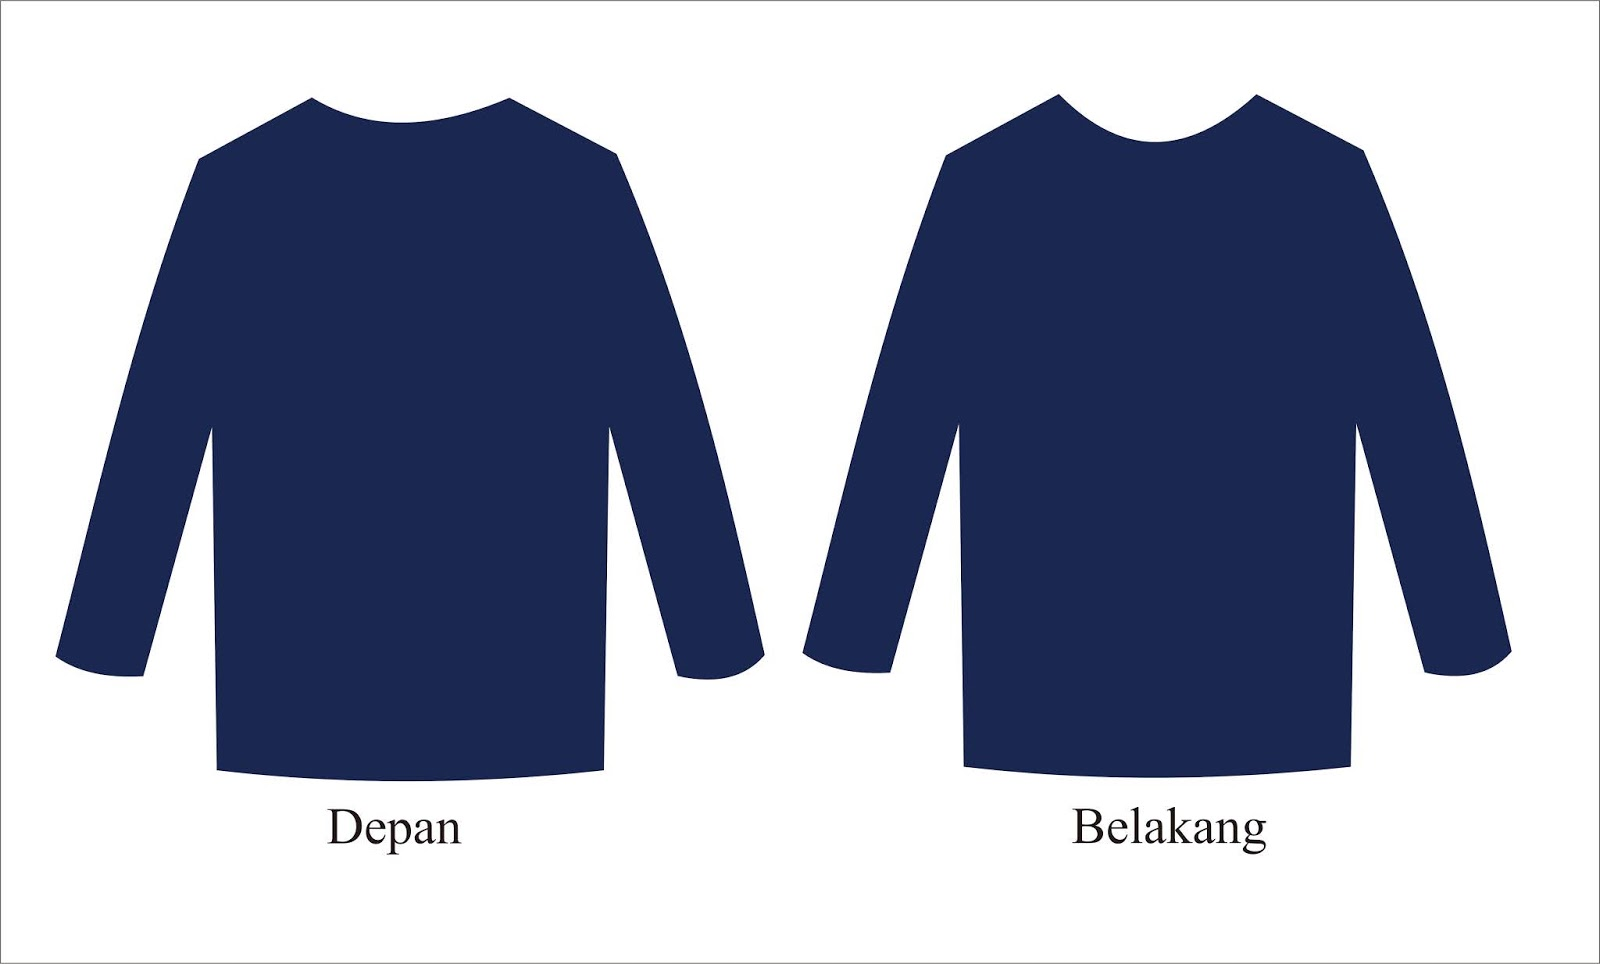 470+ Desain Baju Kaos Keren Depan Belakang HD Terbaik